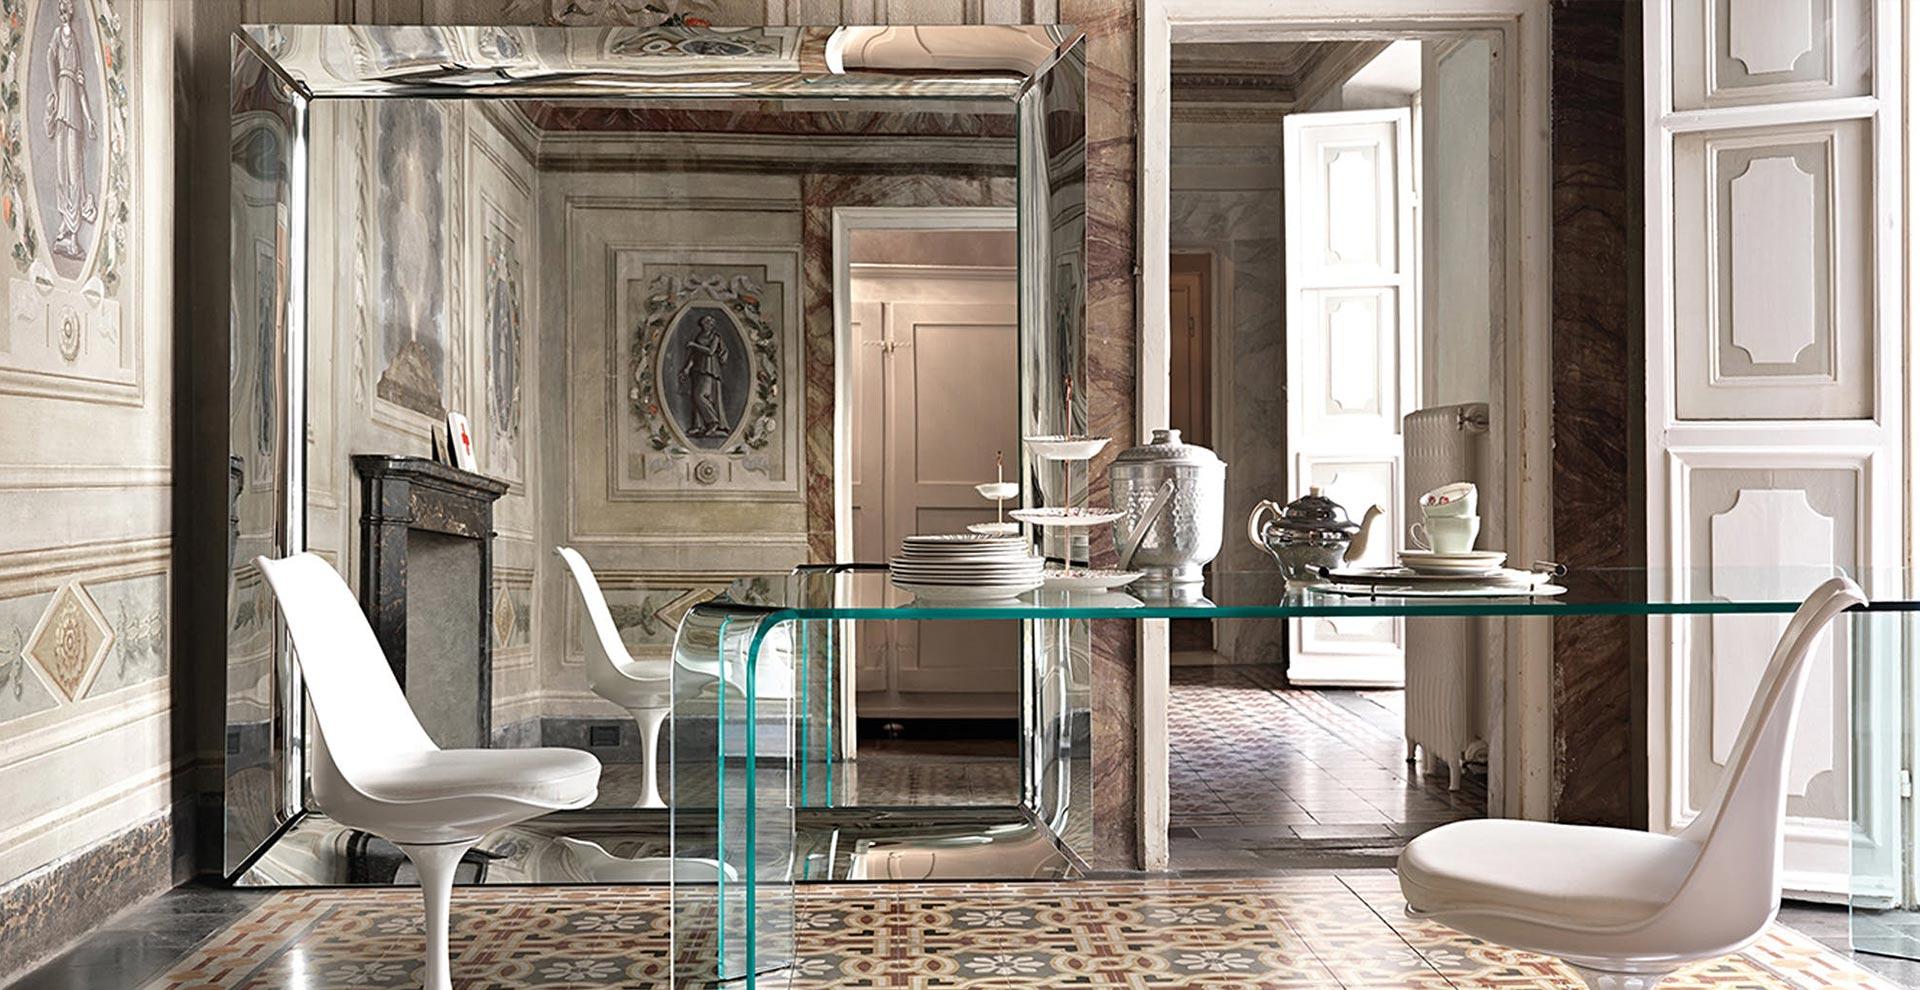 caadre fiam italia specchio caadre fiam italia fiam italia. Black Bedroom Furniture Sets. Home Design Ideas